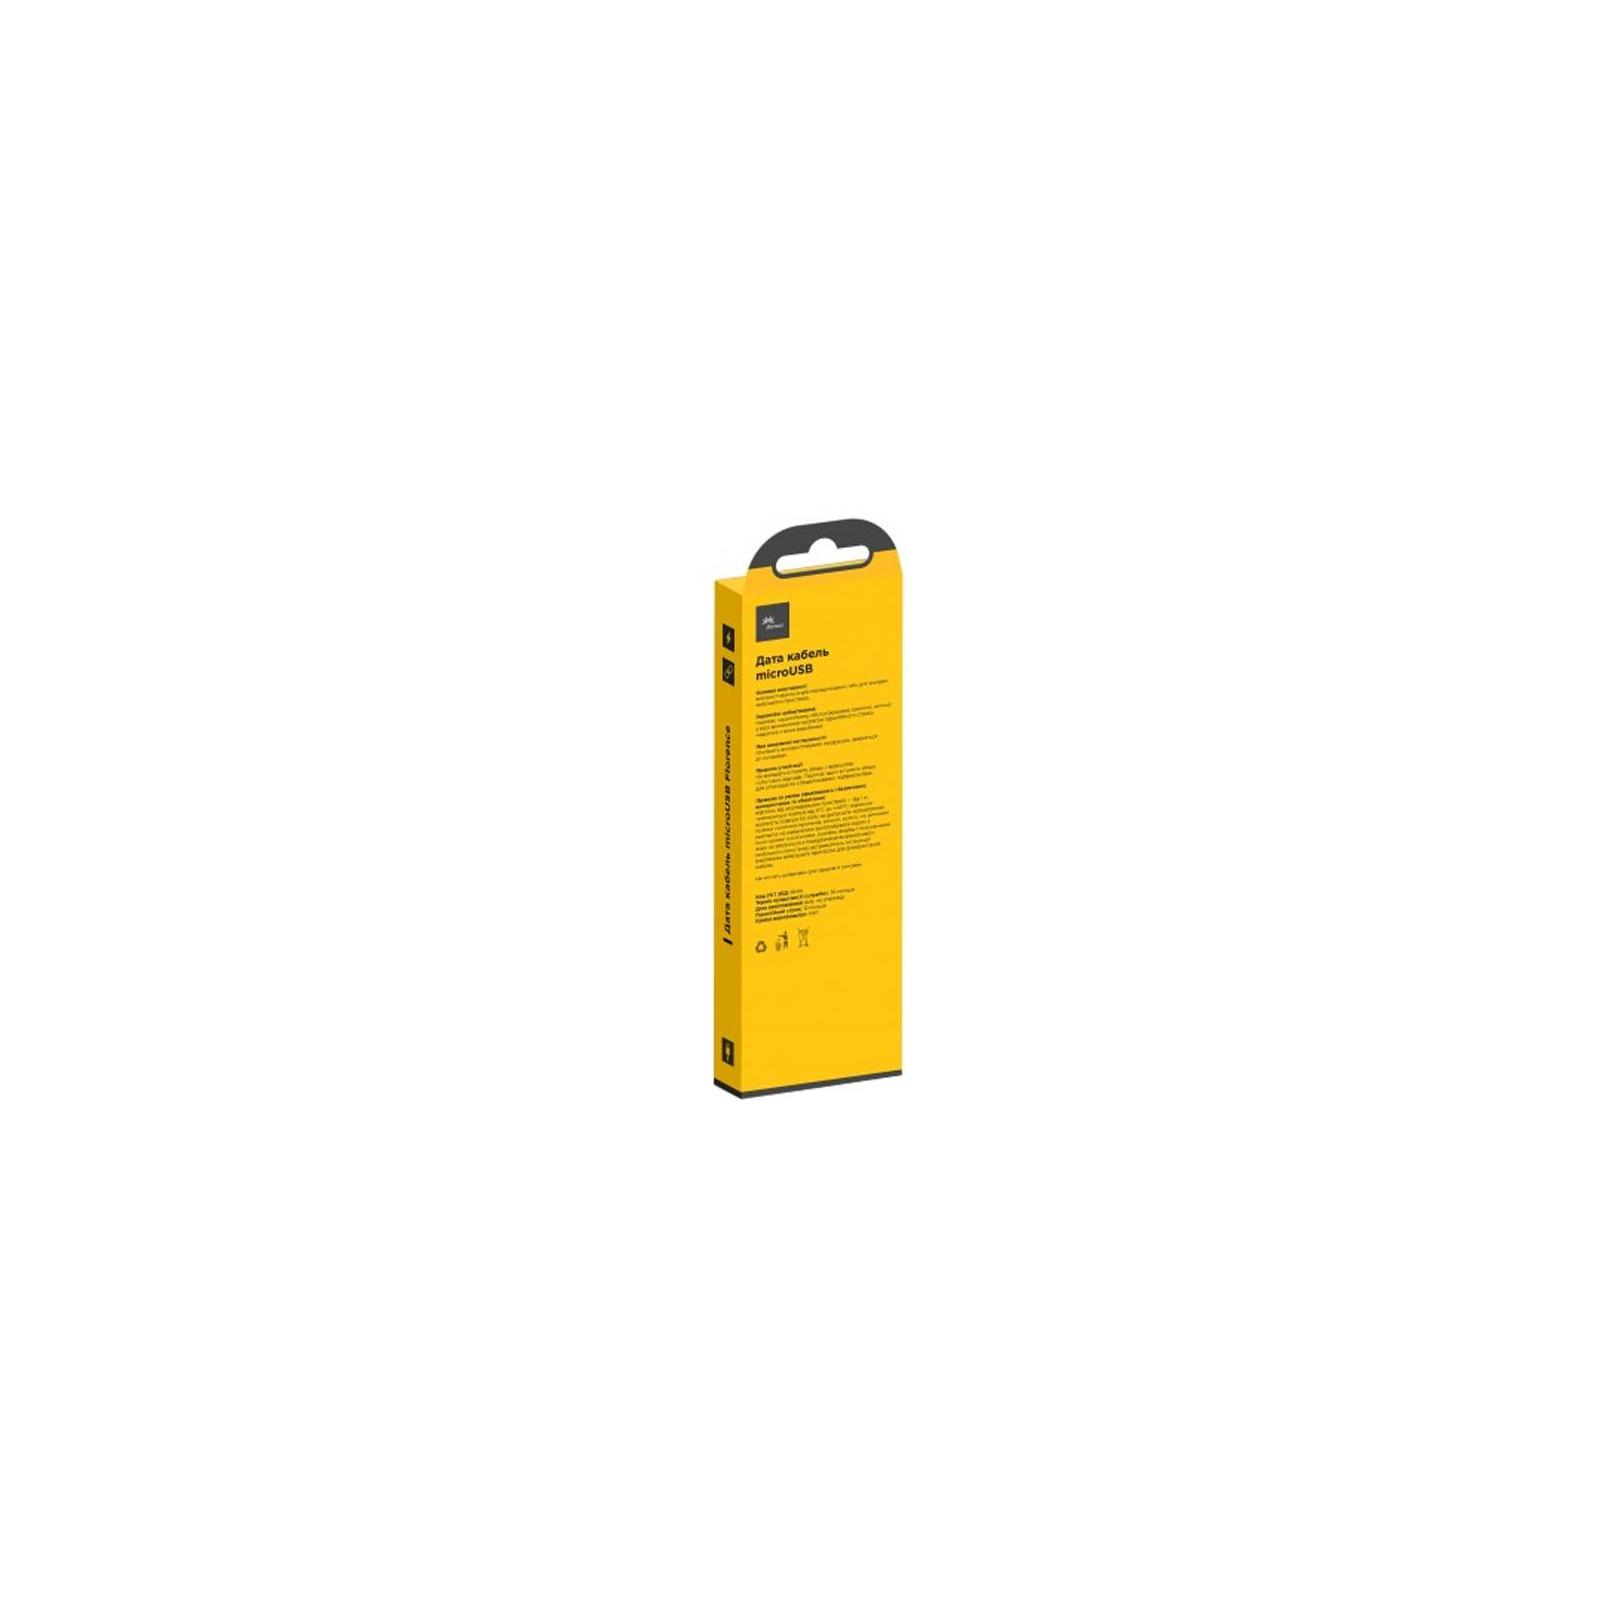 Дата кабель USB 2.0 AM to Micro 5P 1.0m Black Florence (FD-M1-2B) изображение 2